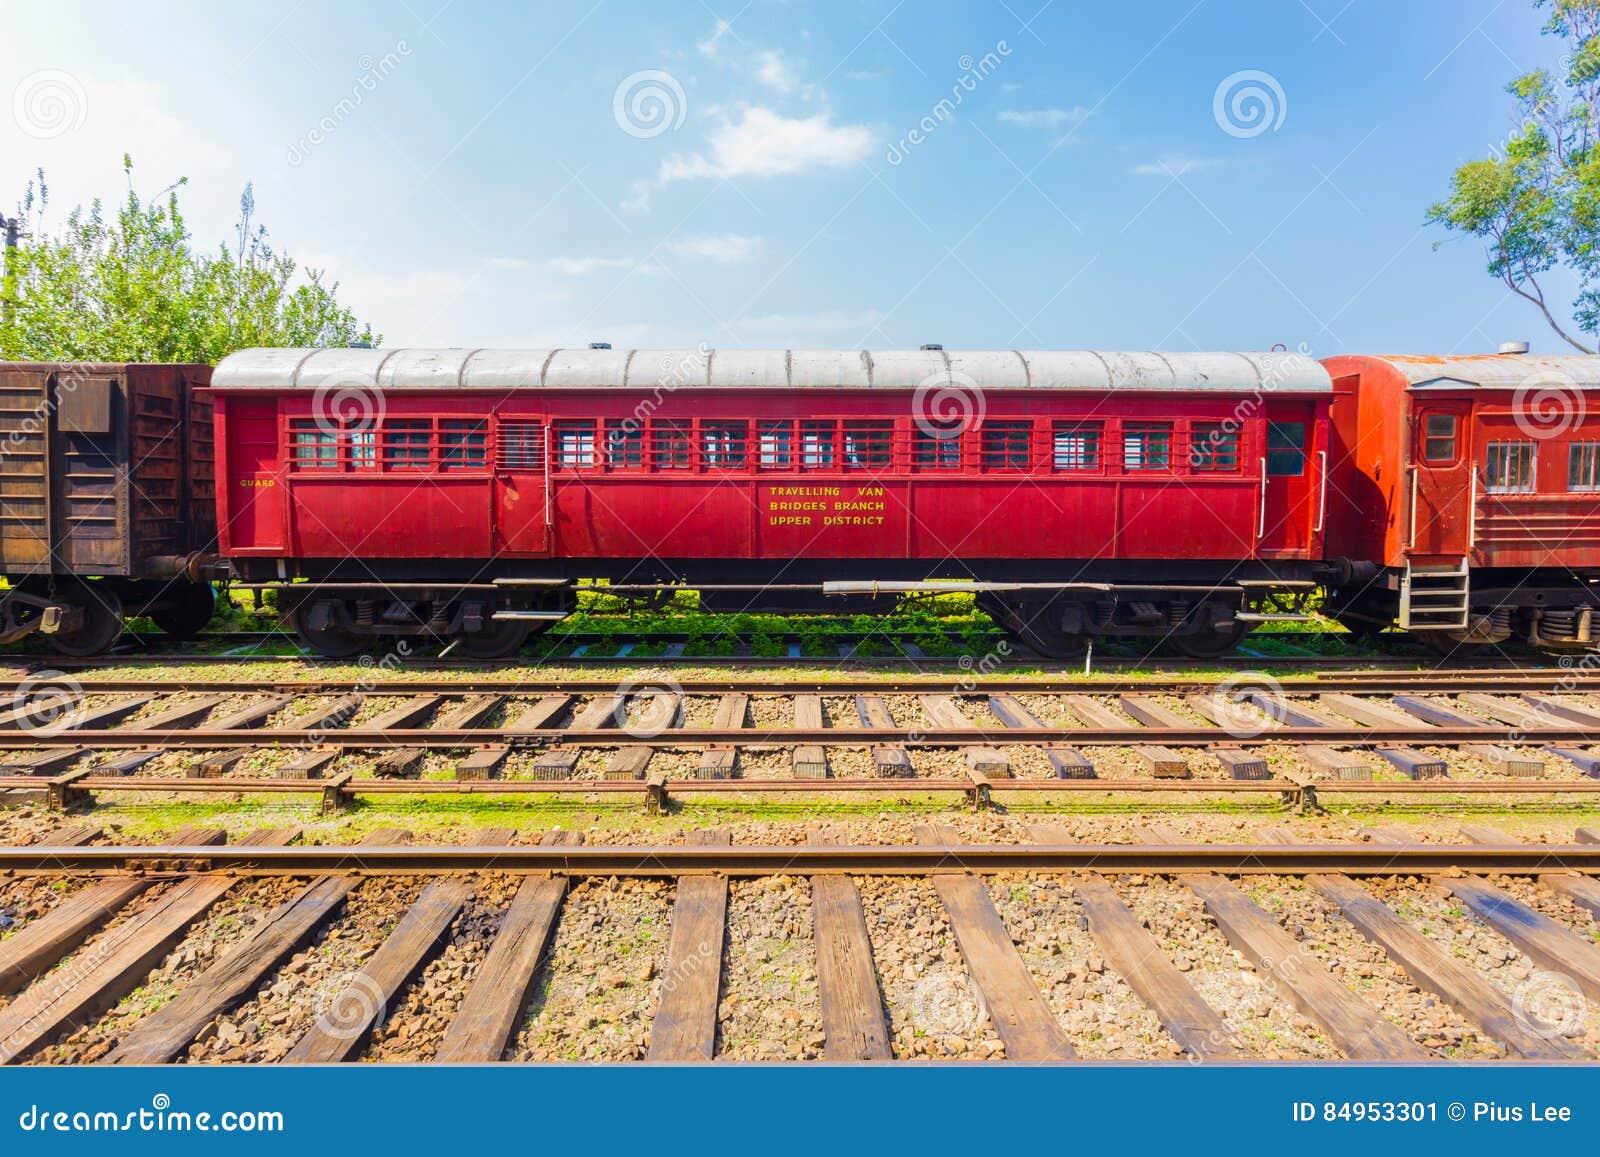 Train Track Passenger Carriage Sri Lanka Railway H